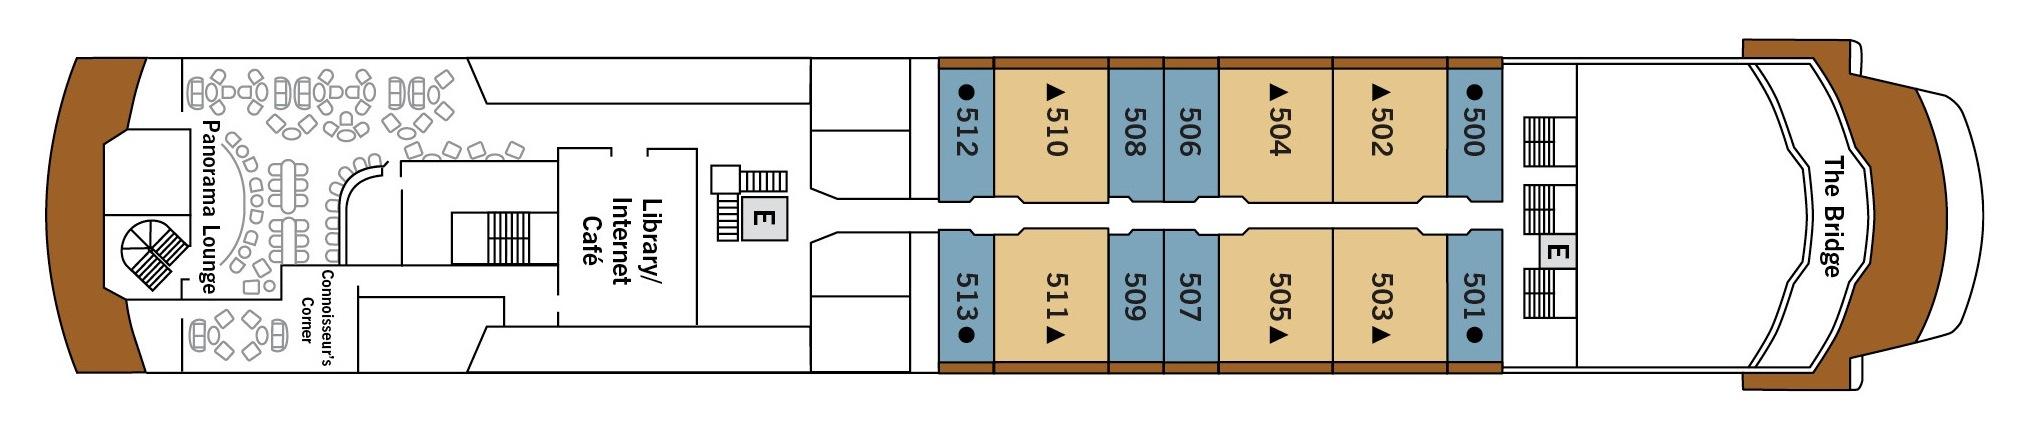 Silversea Cruises Silver Explorer Deck Plans Deck 5.jpg